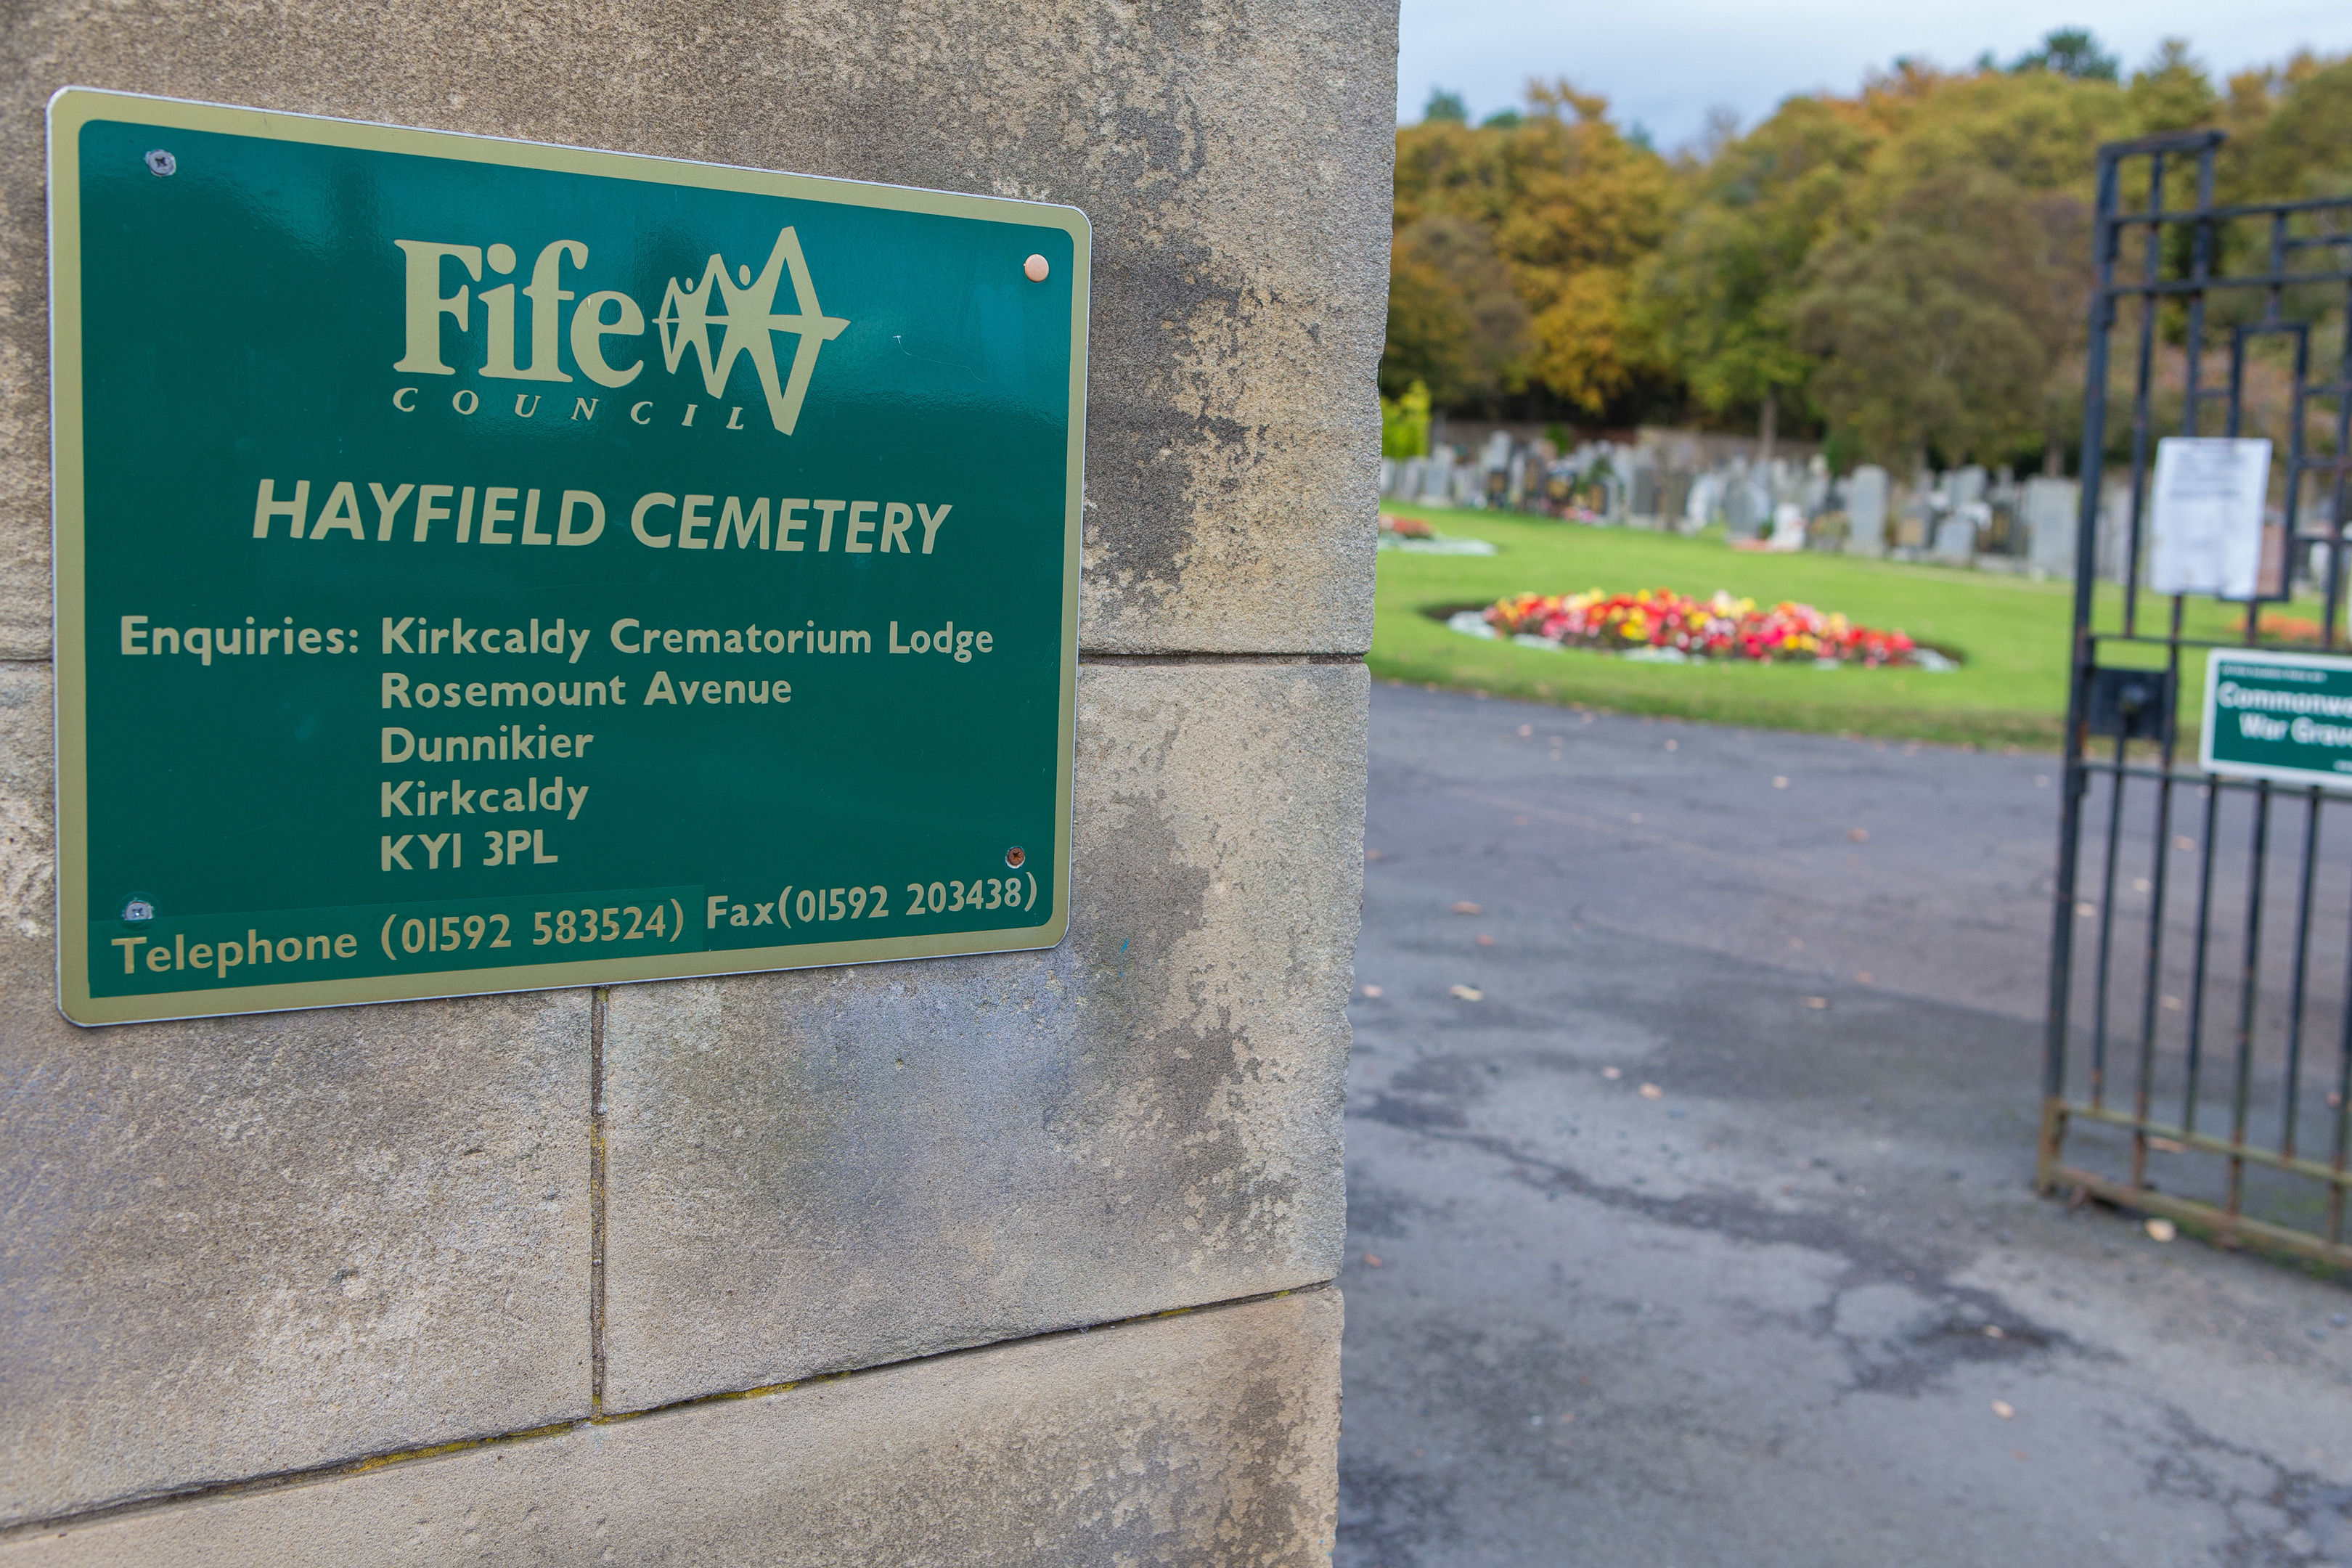 Hayfield Cemetery in Kirkcaldy